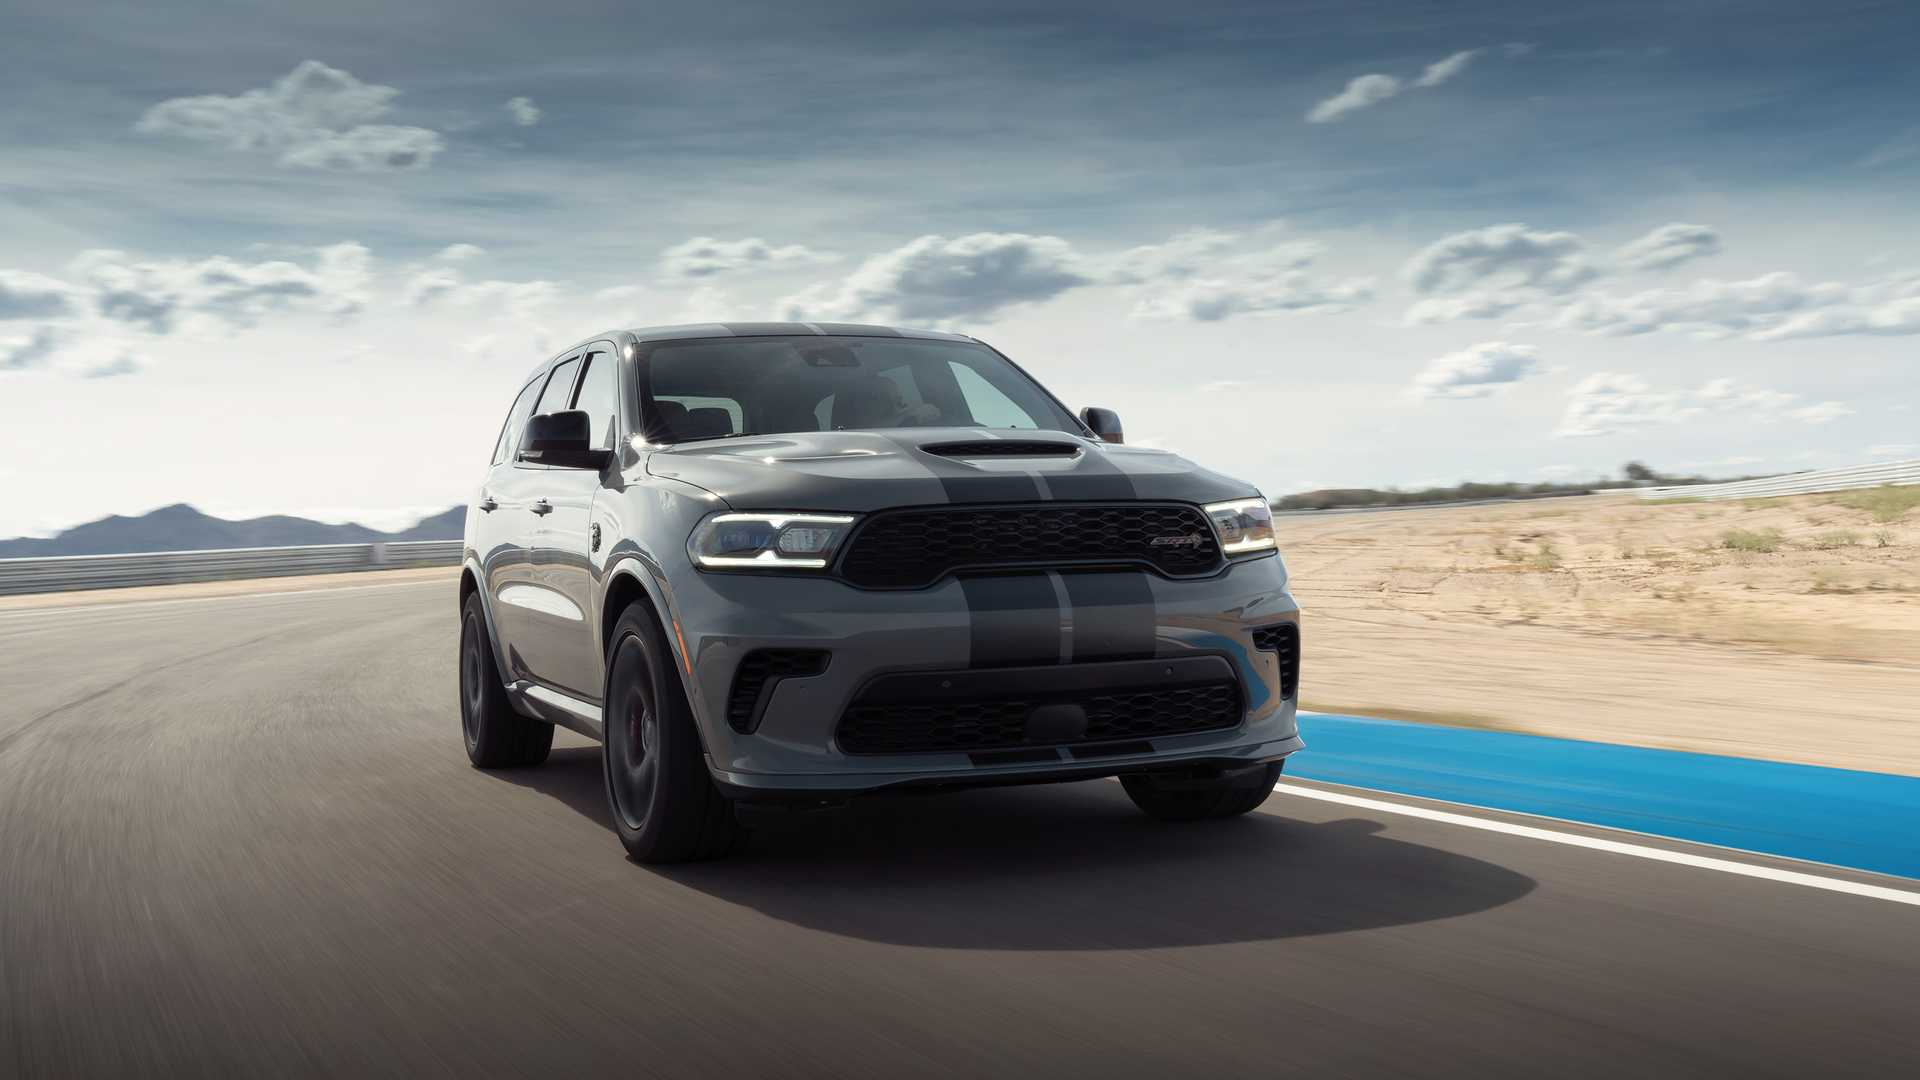 Dodge Durango SRT Hellcat, Challenger SRT Super Stock, Charger Redeye Debut